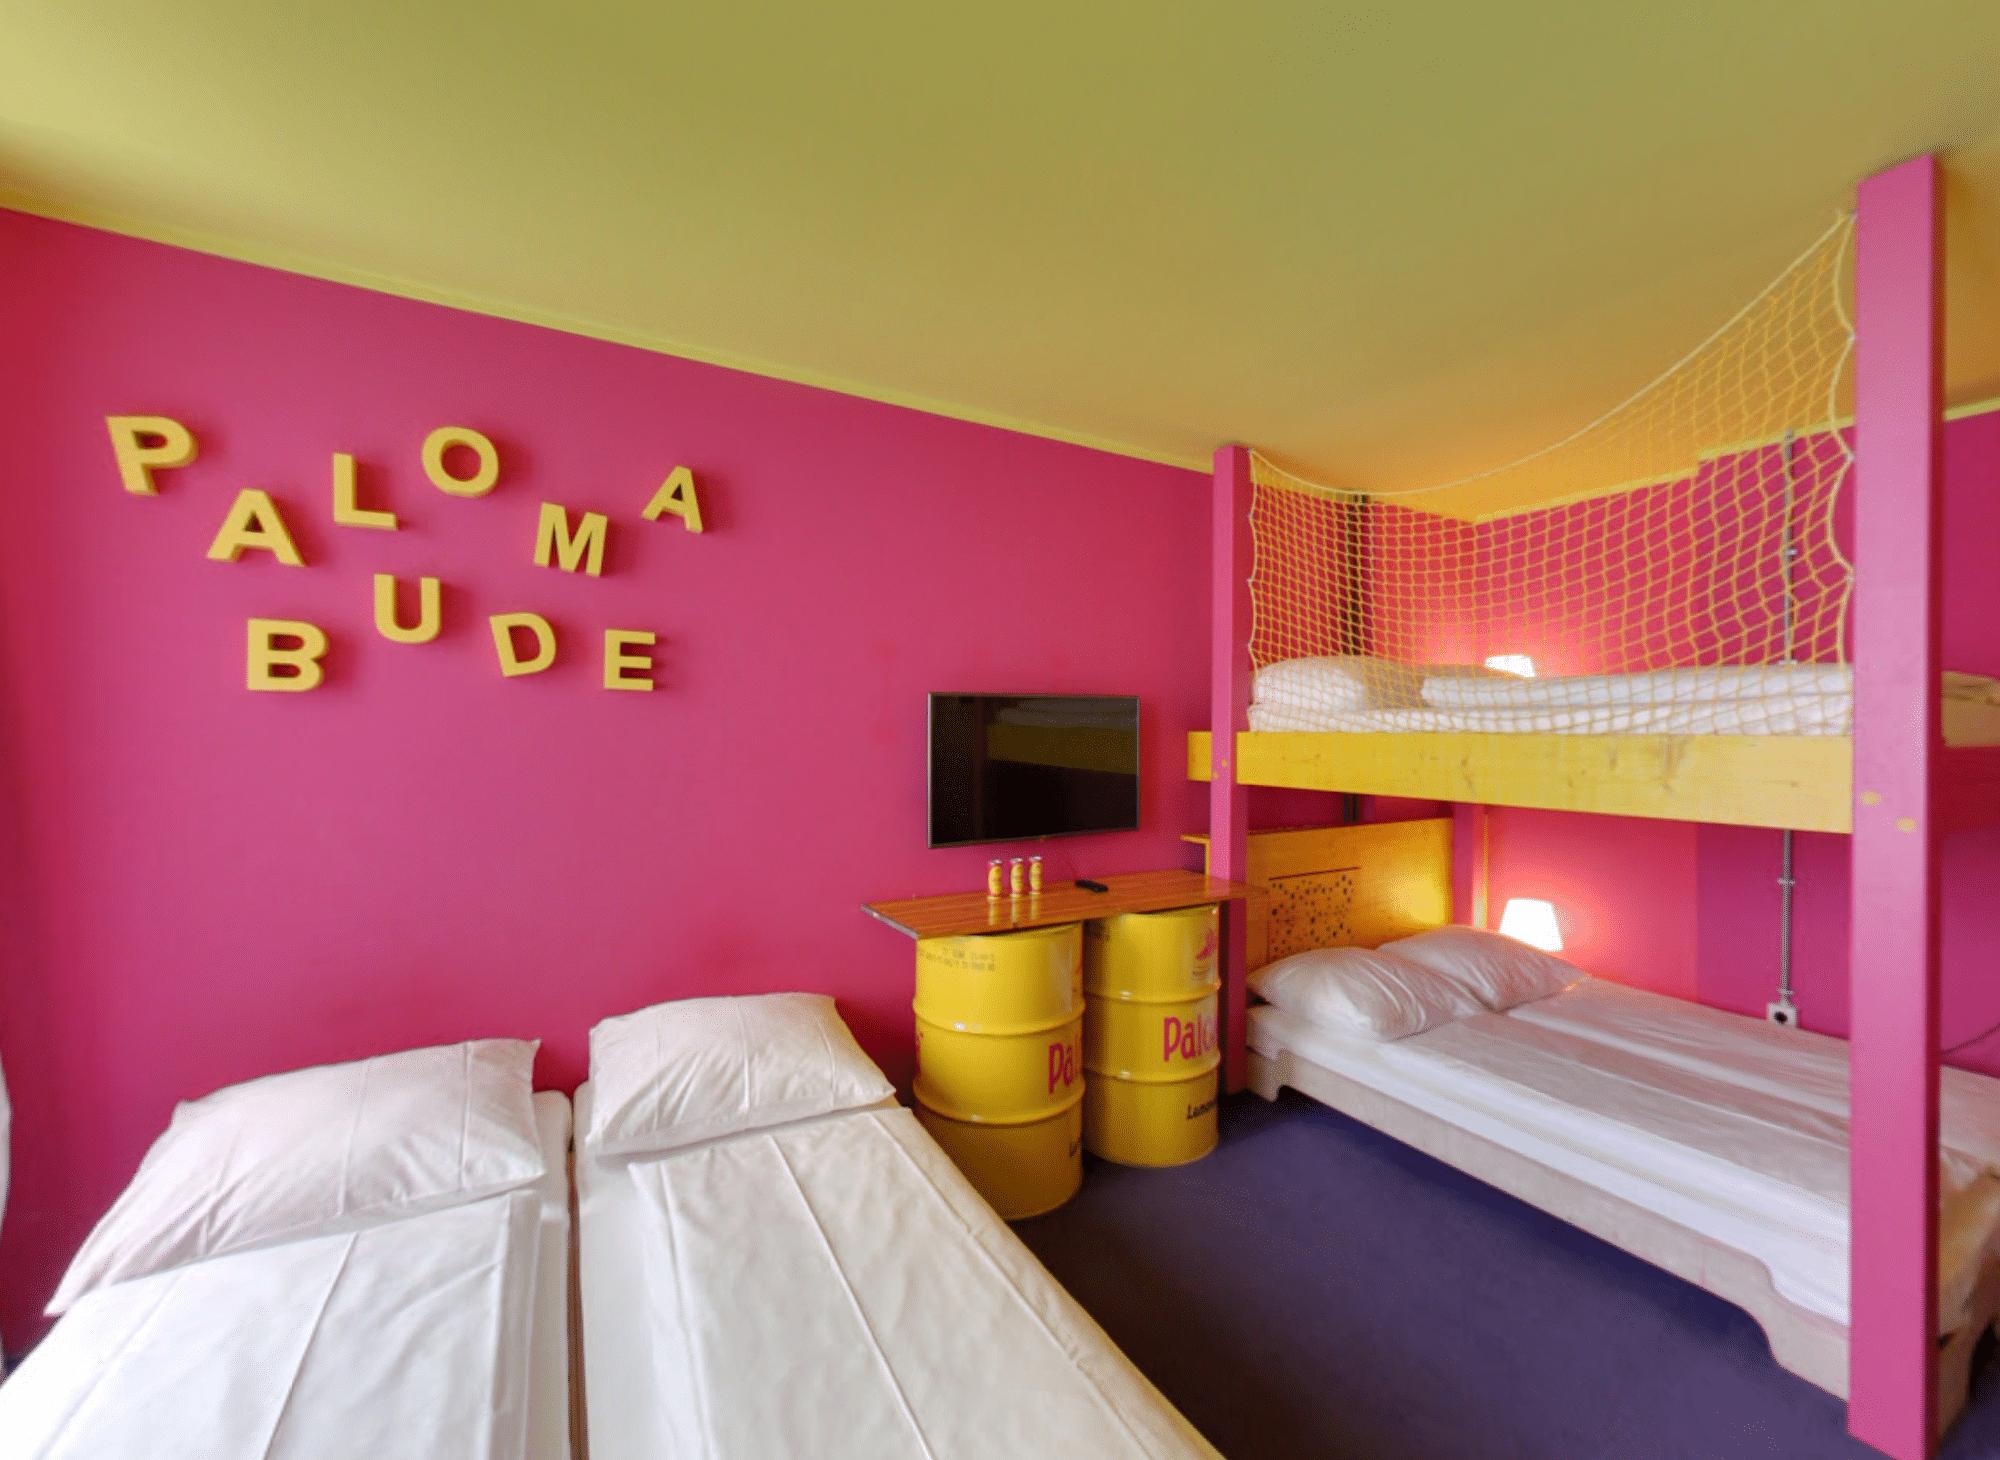 superbude hotel hostel st georg patrick roddelkopf fotografie